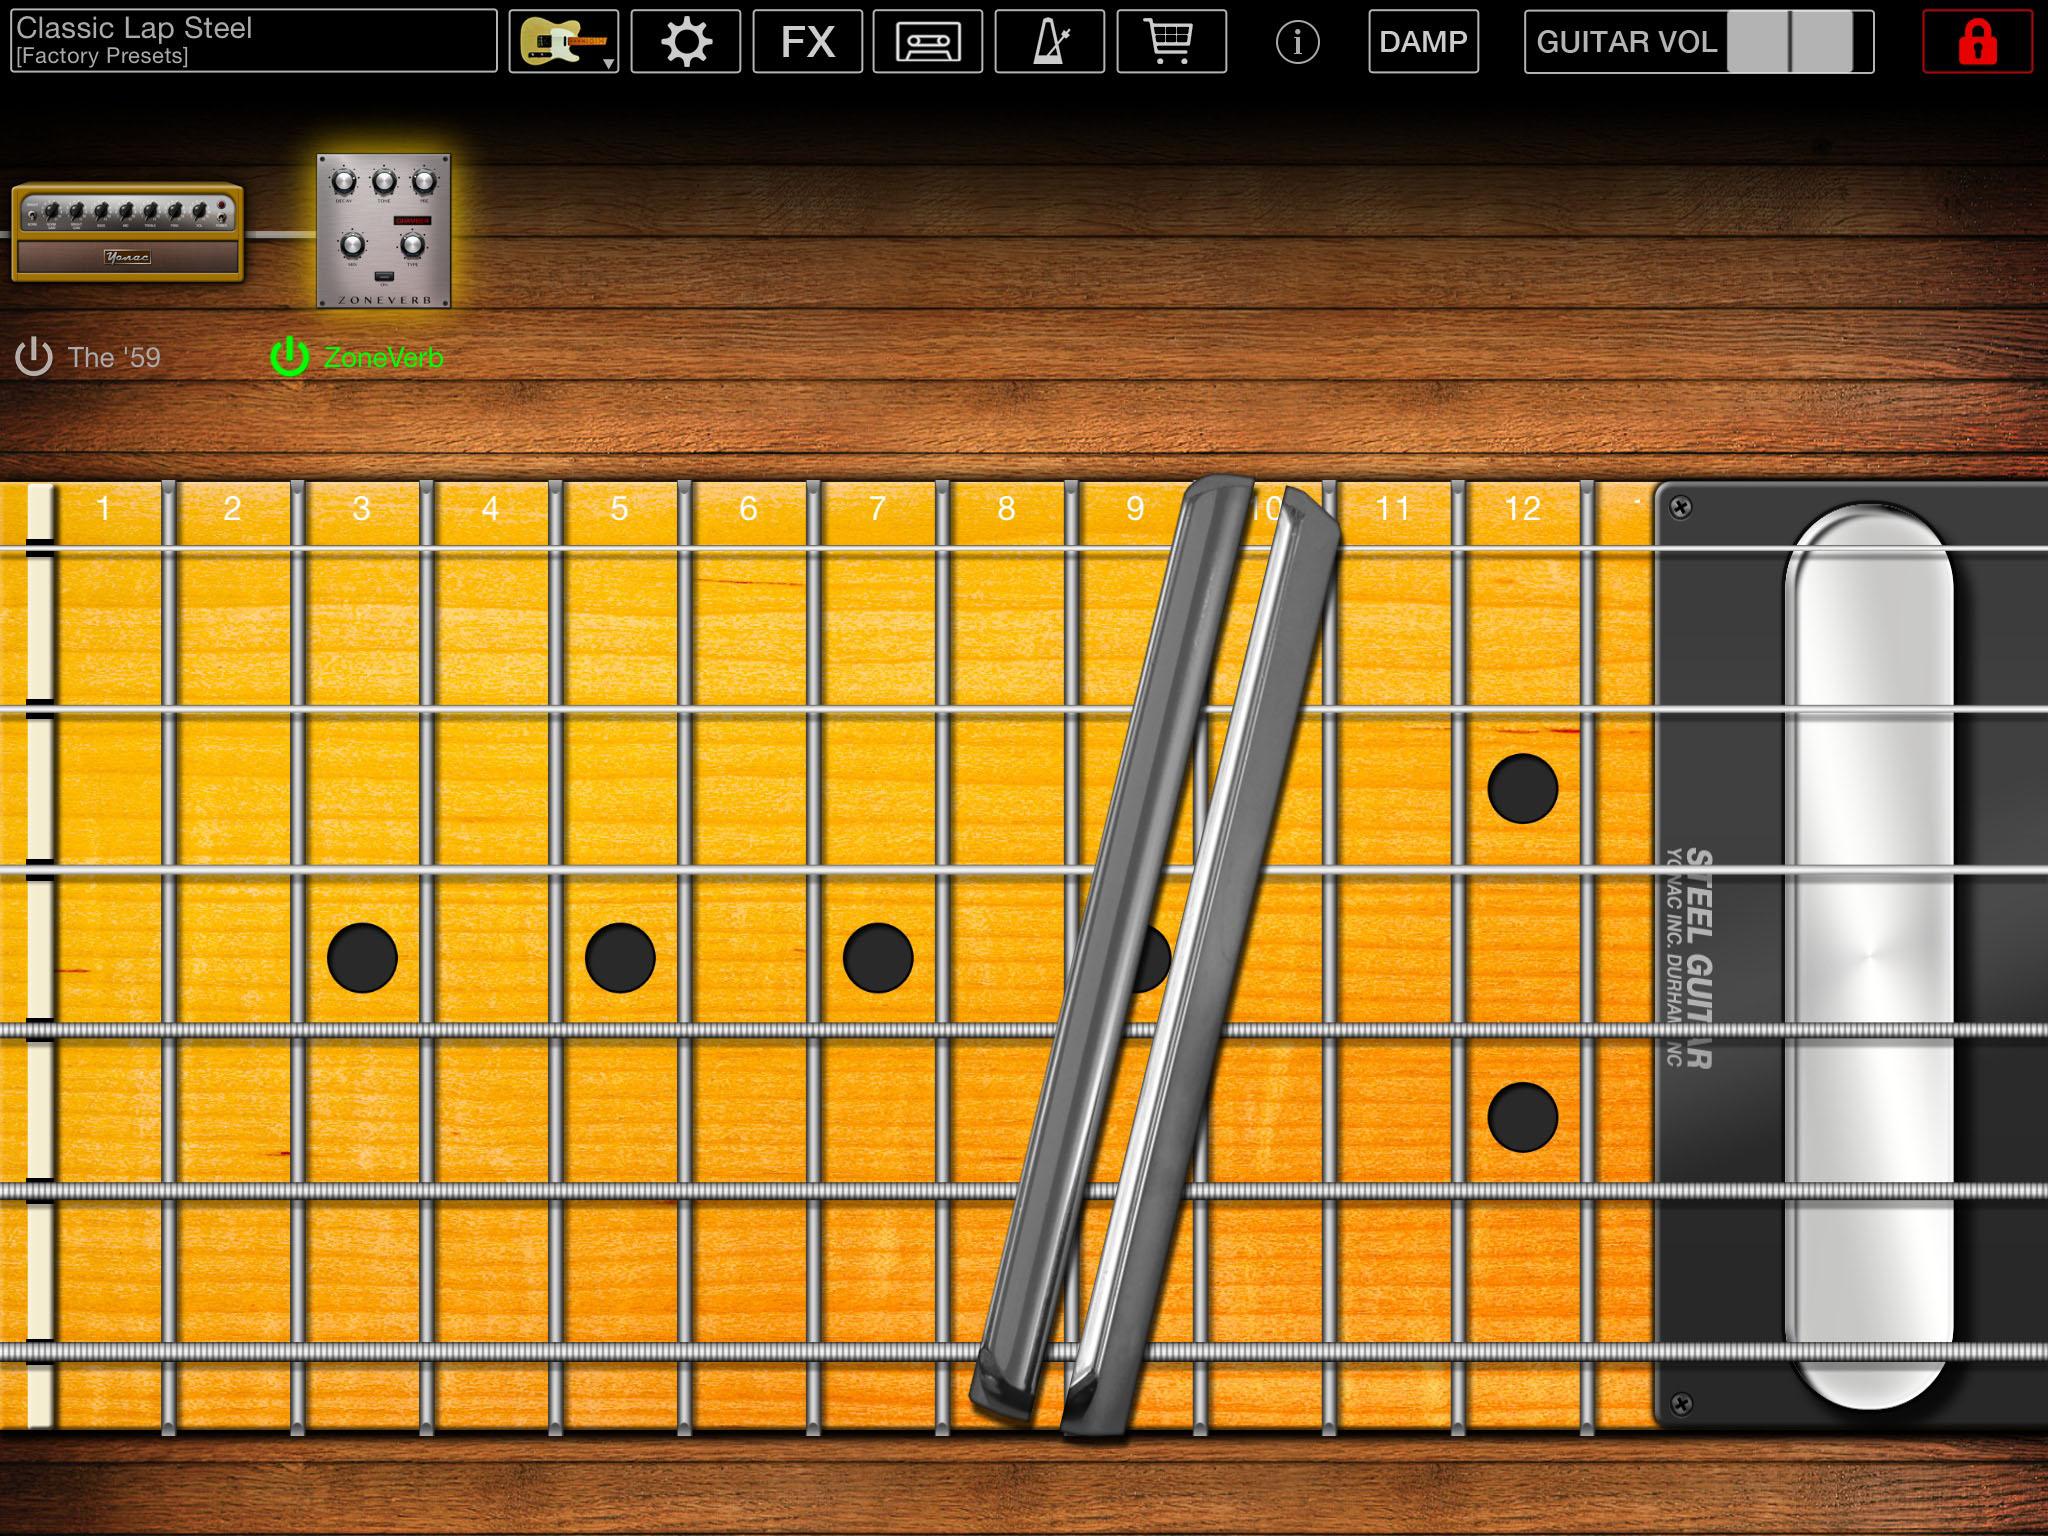 Steel Guitar Review Pedal Steel Guitar App From Yonac Gets A